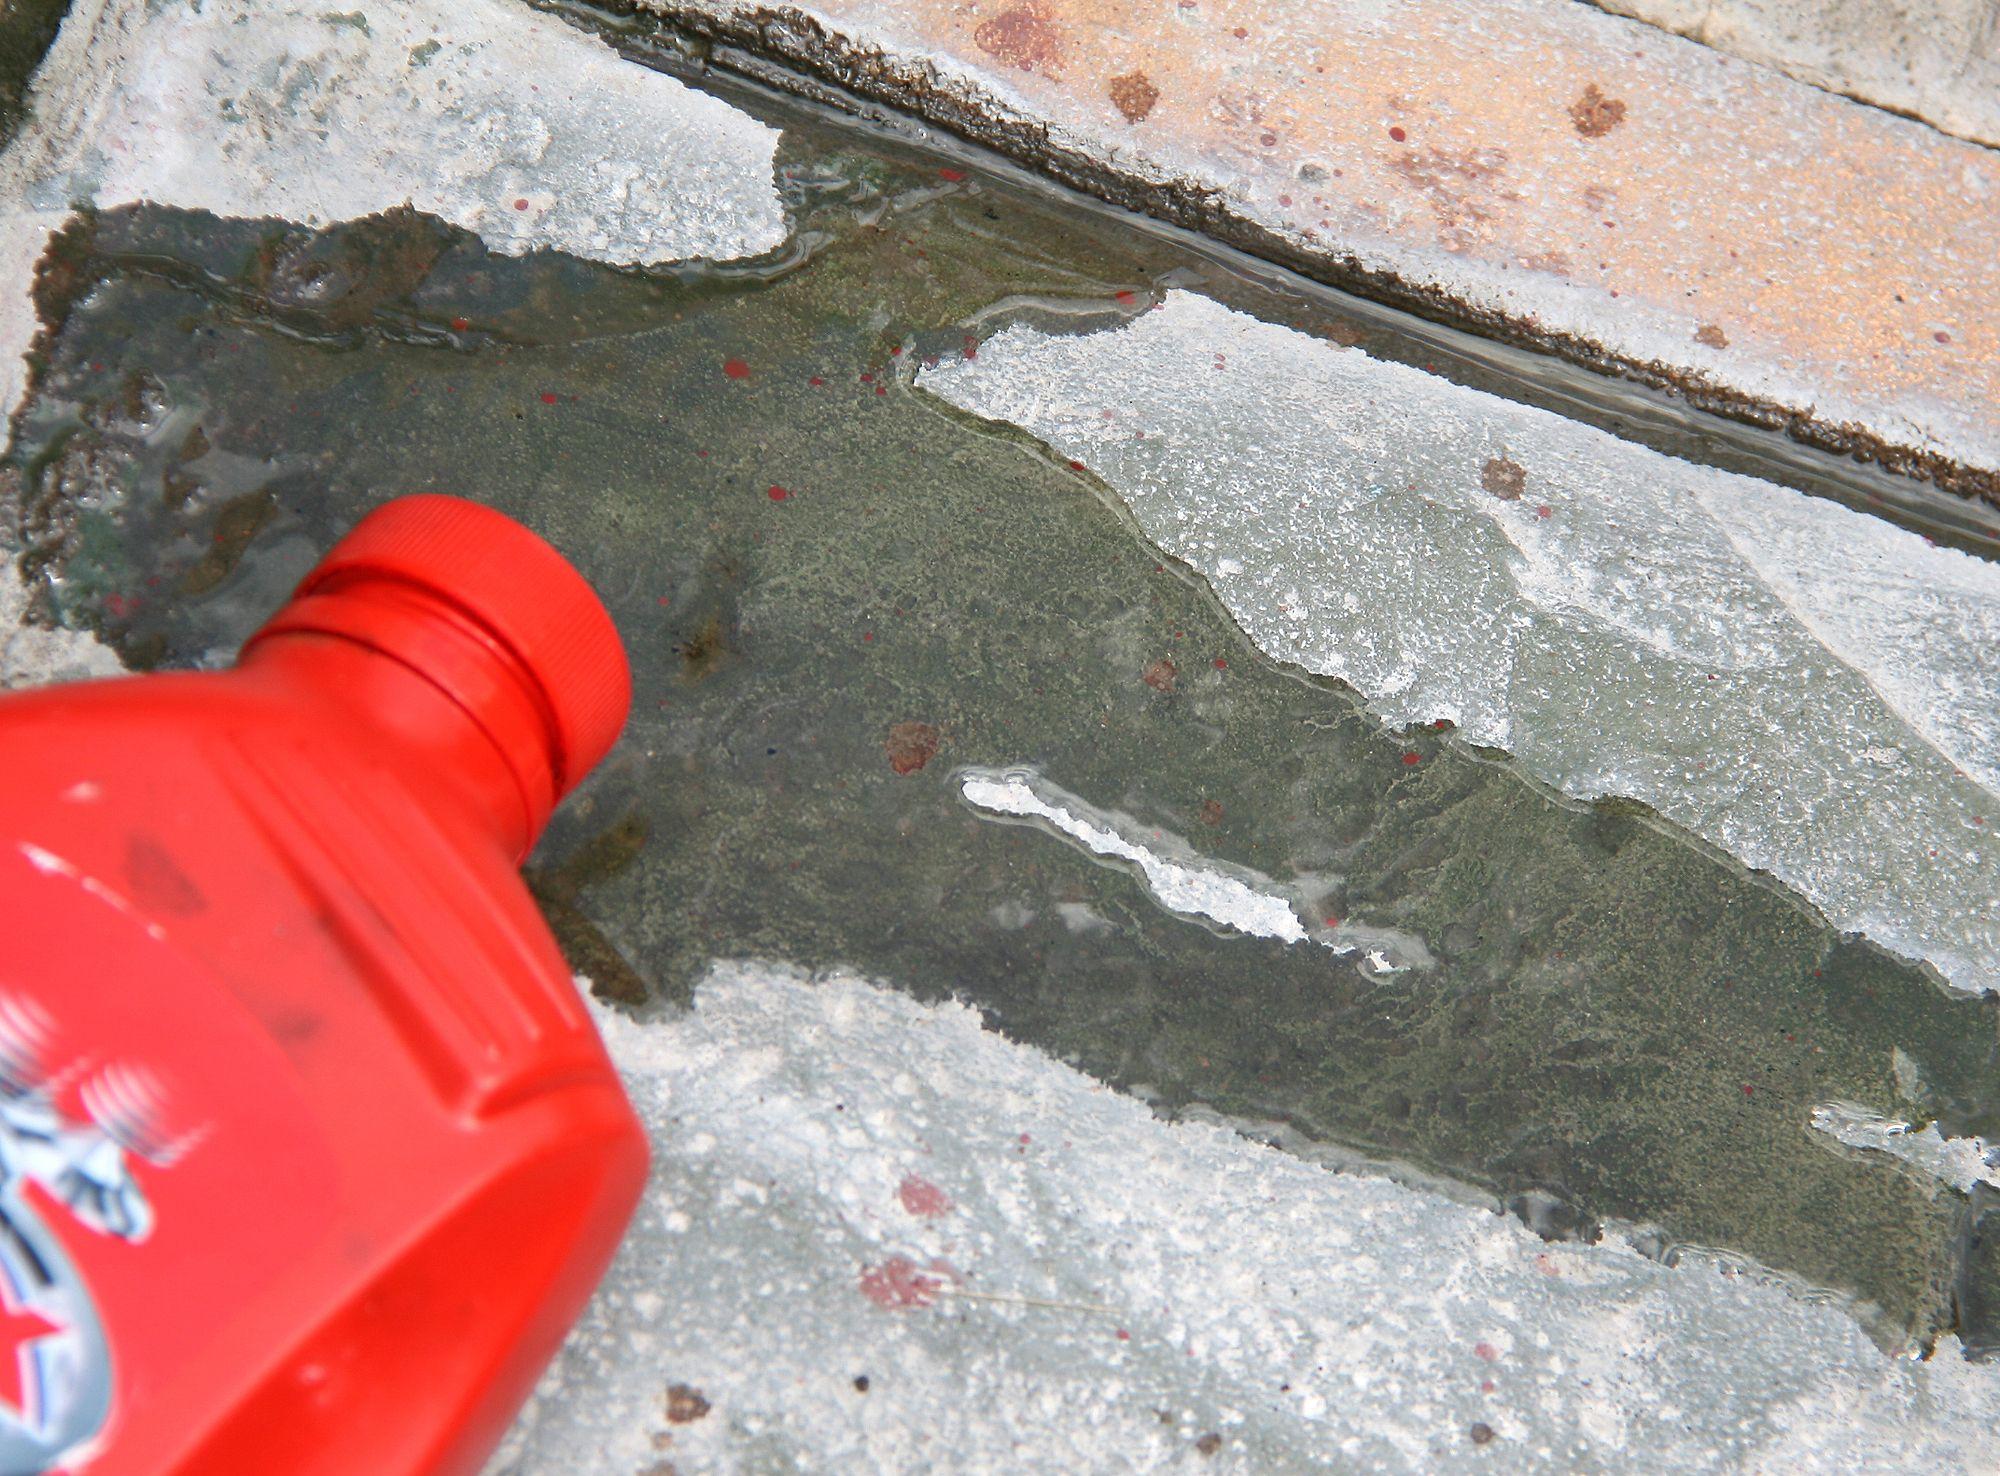 Remove motor oil from concrete driveway concrete for Motor oil stain removal from concrete